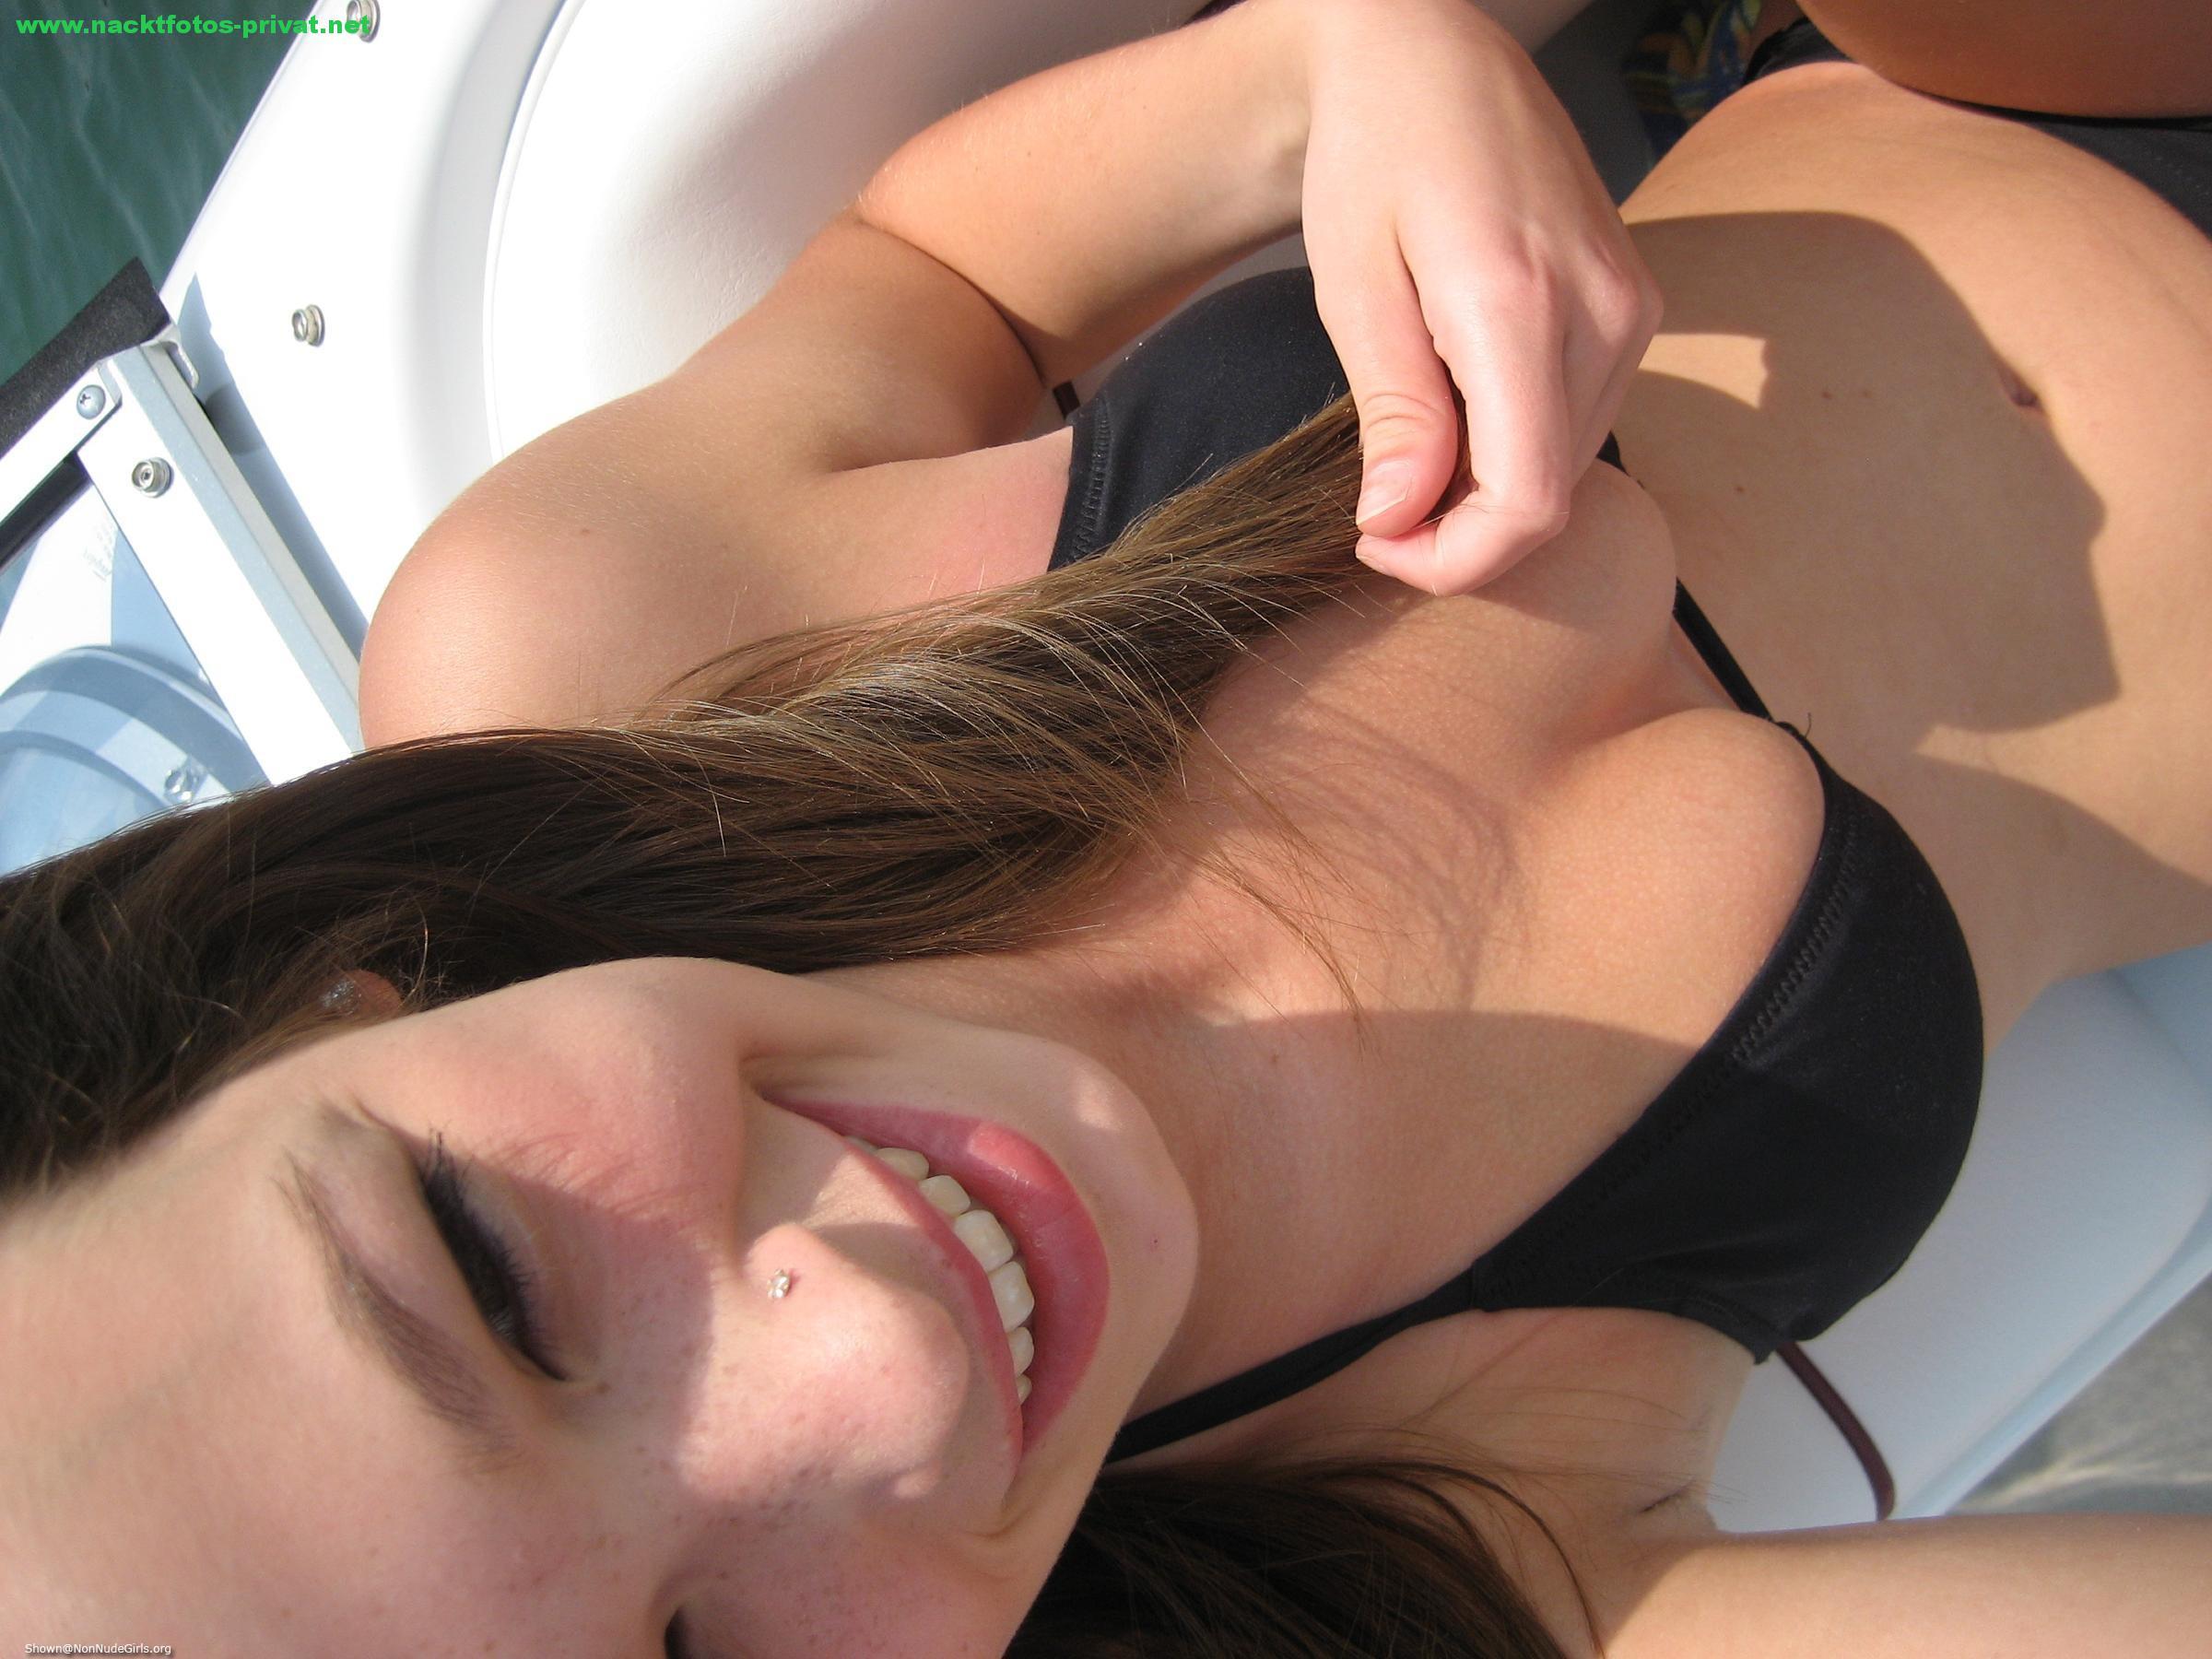 Teen Bikini Selfie